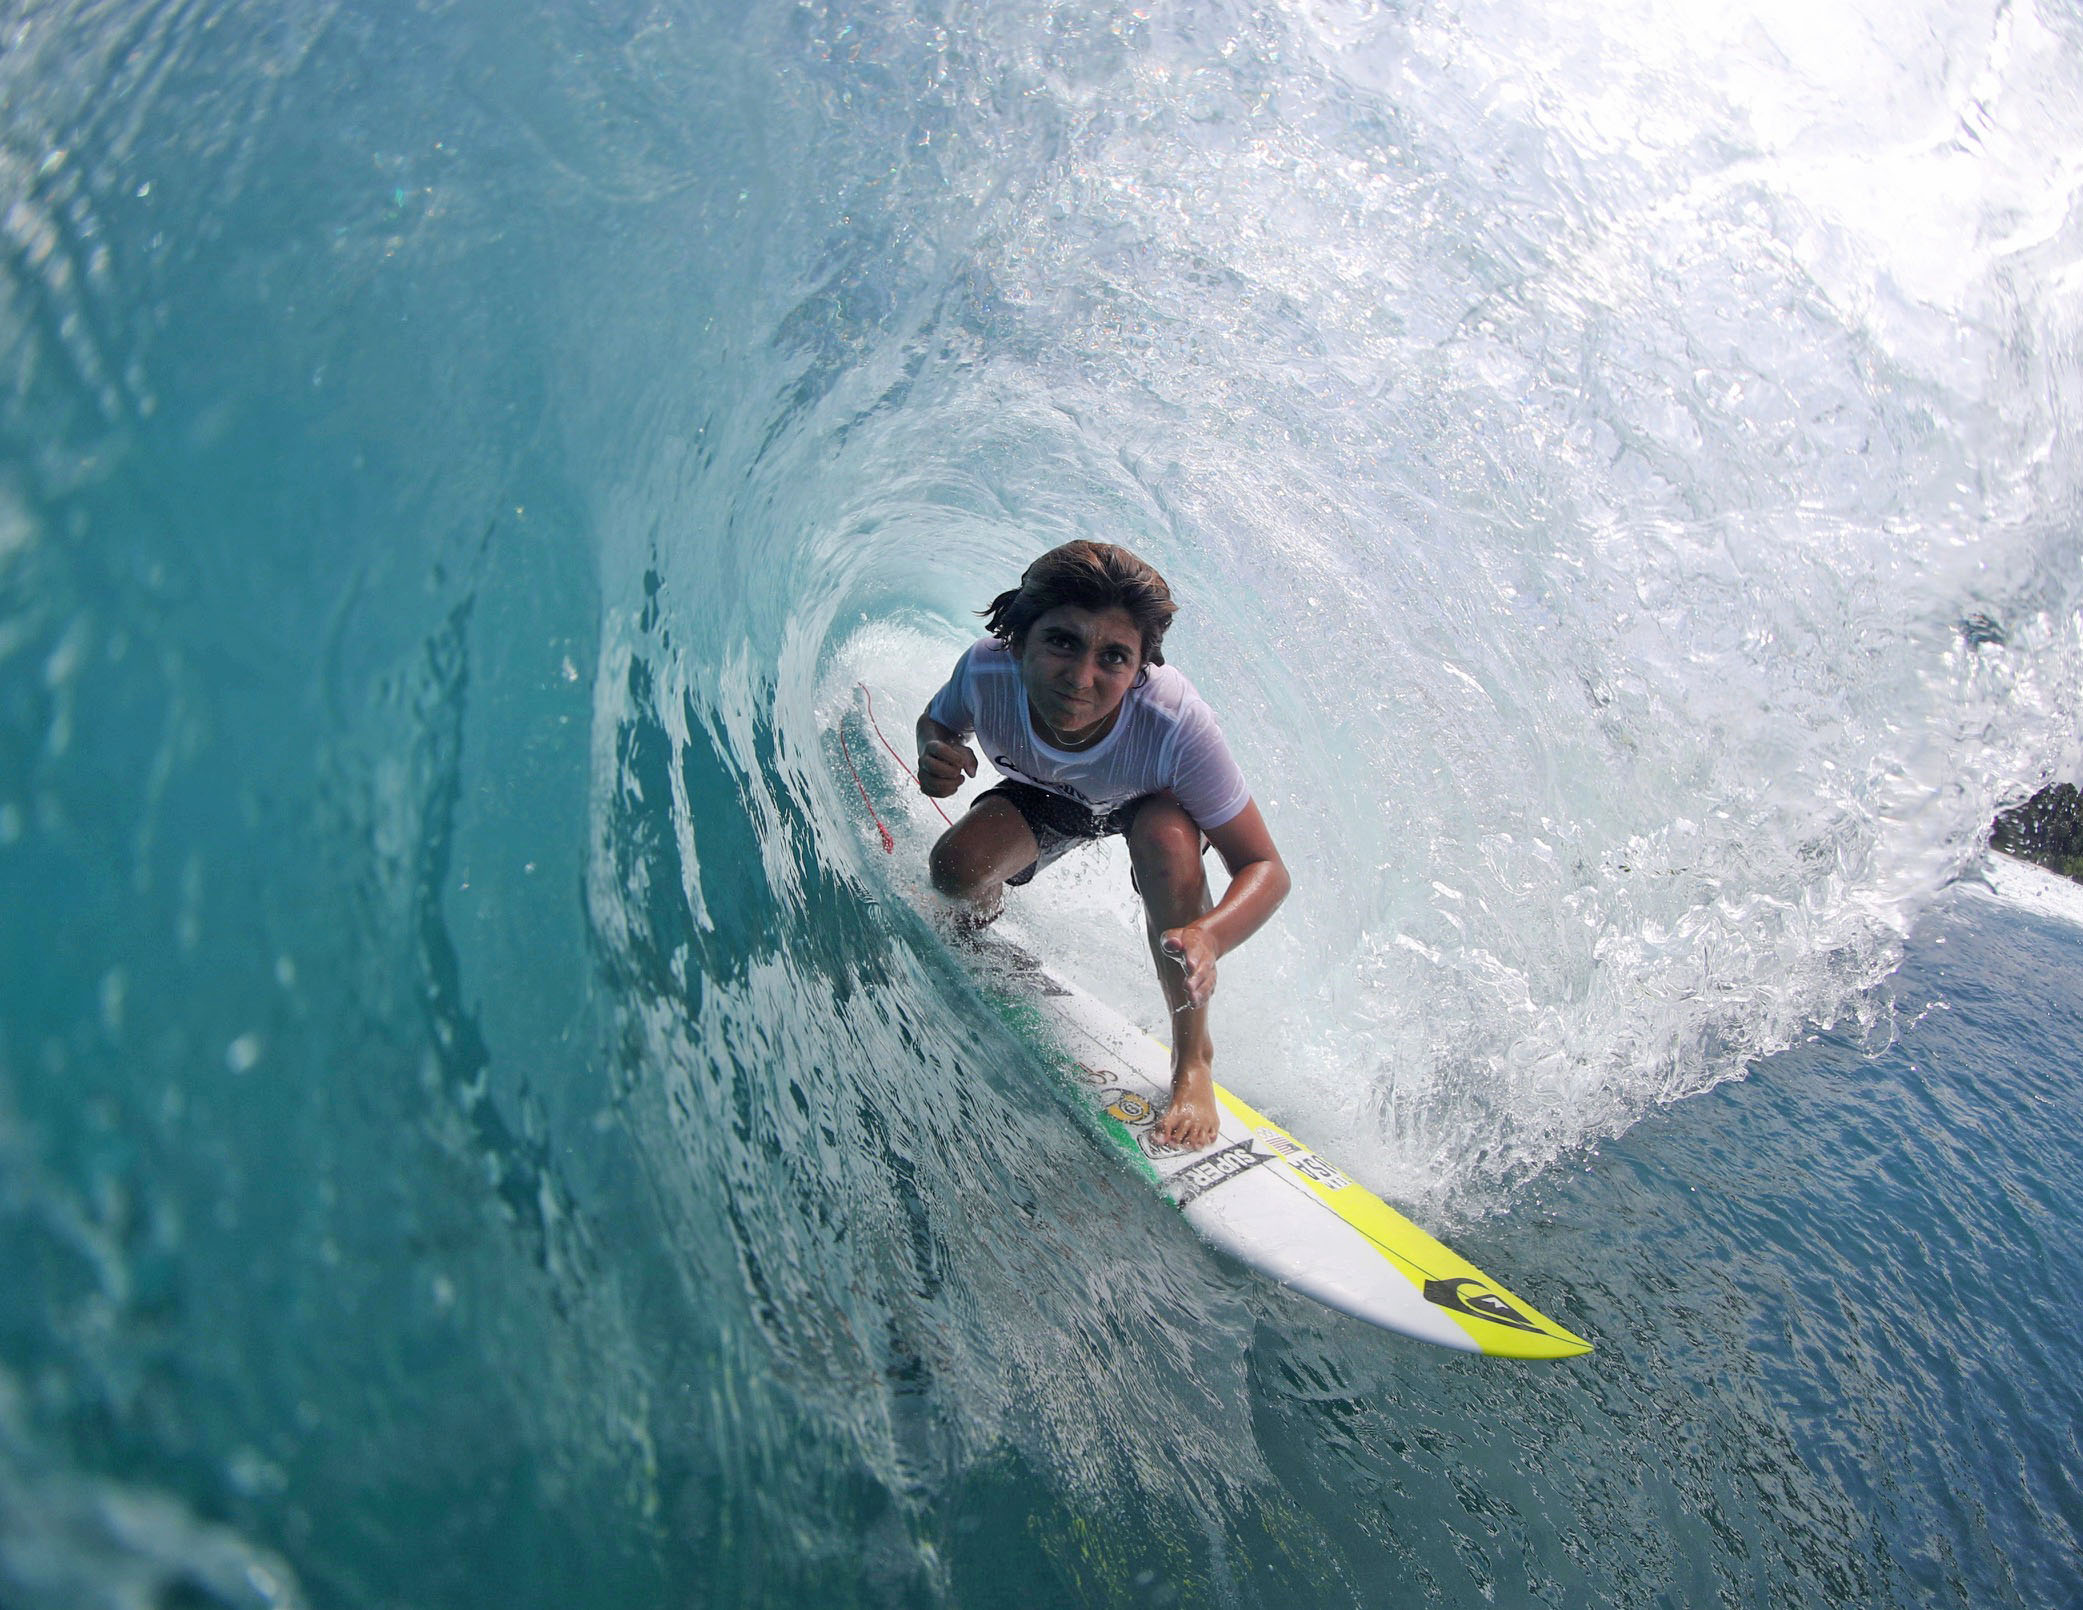 Trevor Murphy Cape Cod Surf Photographer - Surfline - Surfline